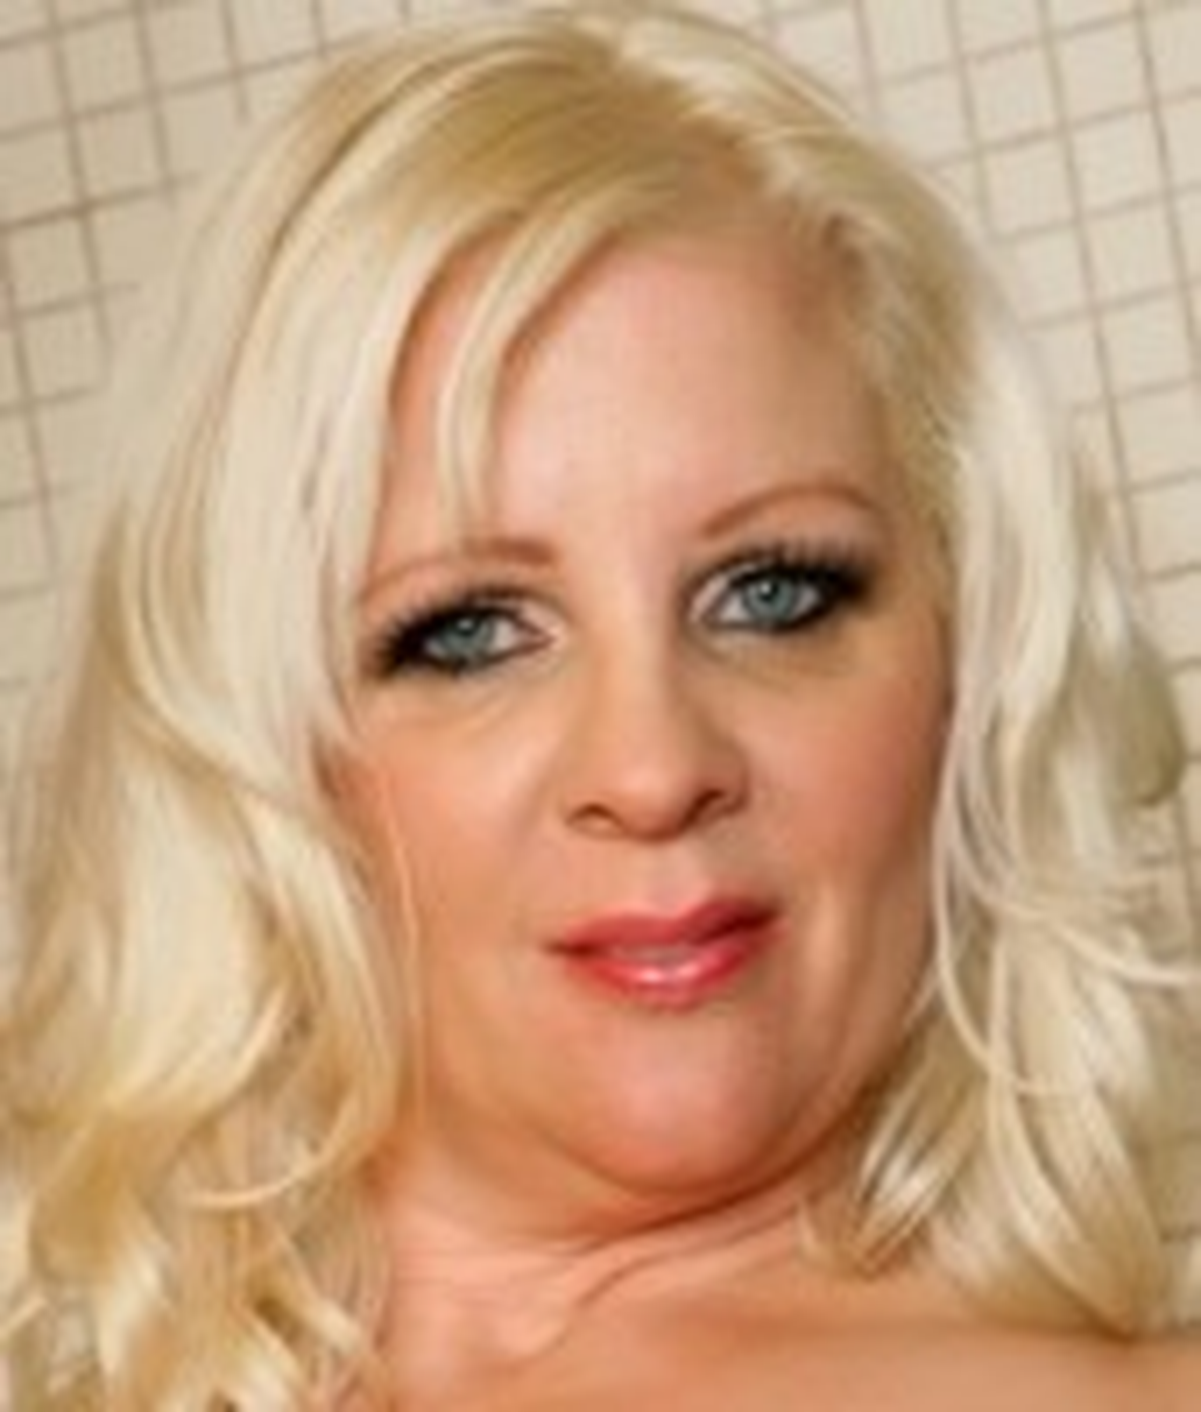 Veronica Vaughn Wiki & Bio - Pornographic Actress